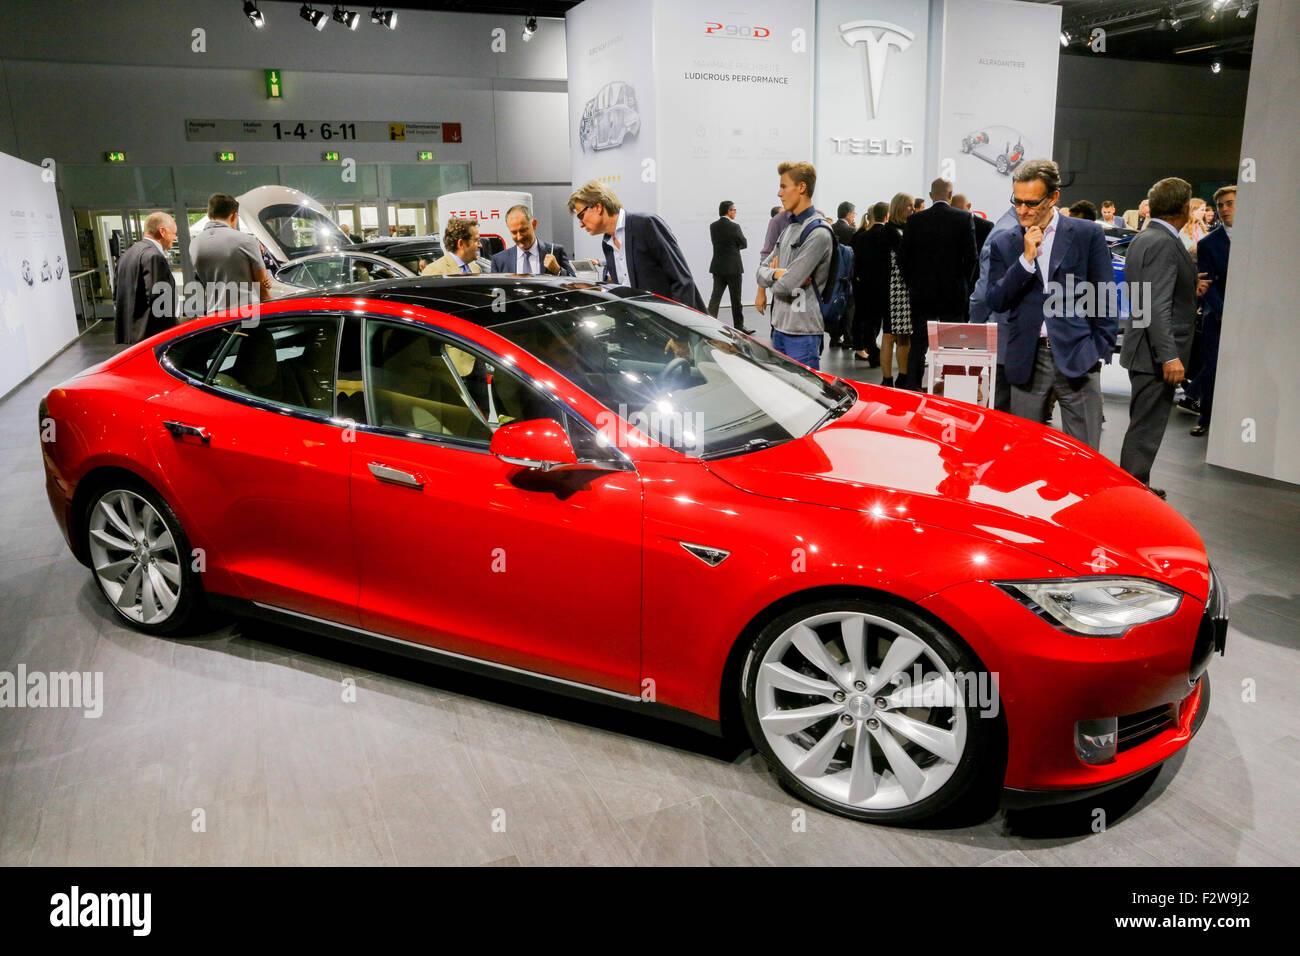 Electric Car TESLA Model S At The Th International Motor Show - Automobil tesla